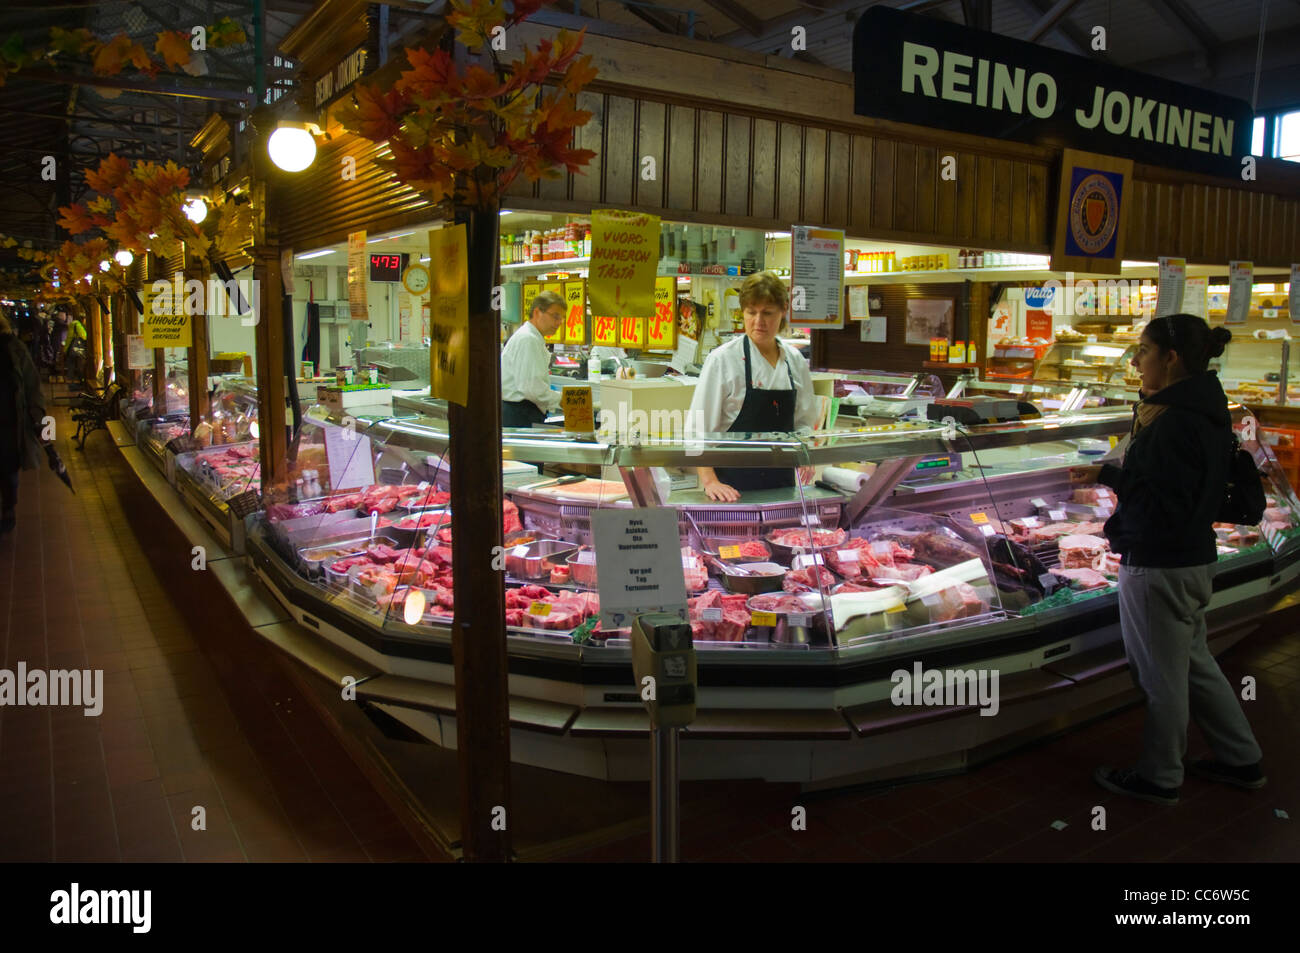 Meat counter Kauppahalli the market hall Turku Finland Europe - Stock Image